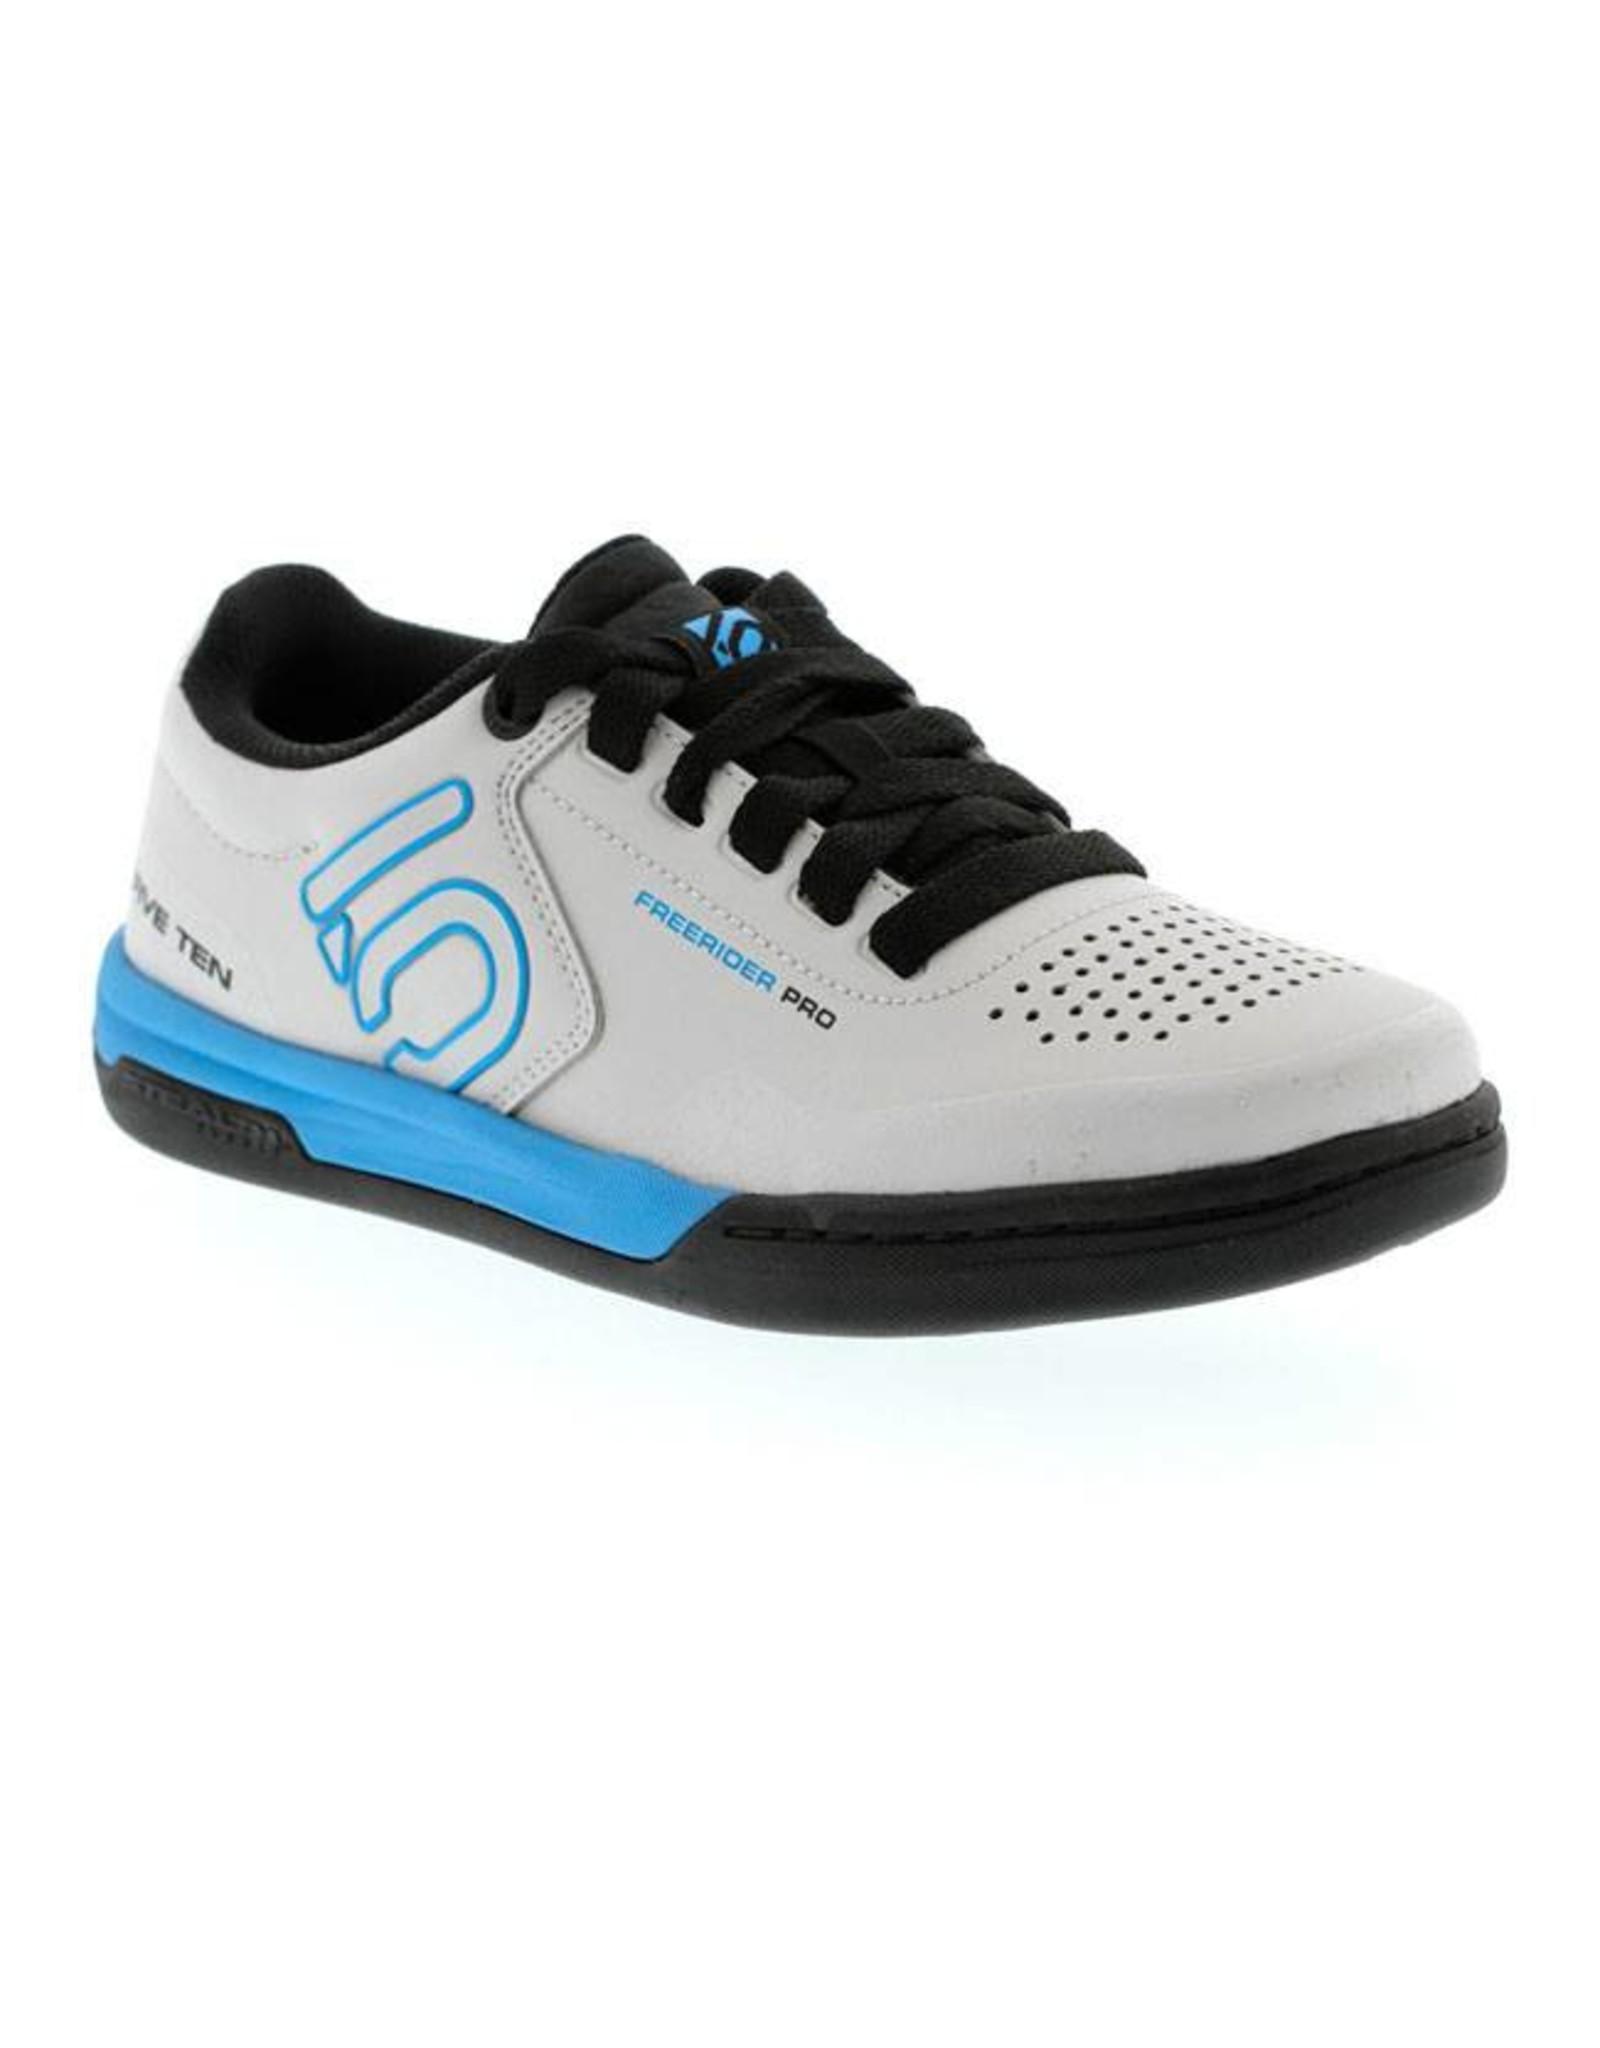 Five Ten Five Ten Freerider Pro Women's Flat Pedal Shoe: Solid Gray 6